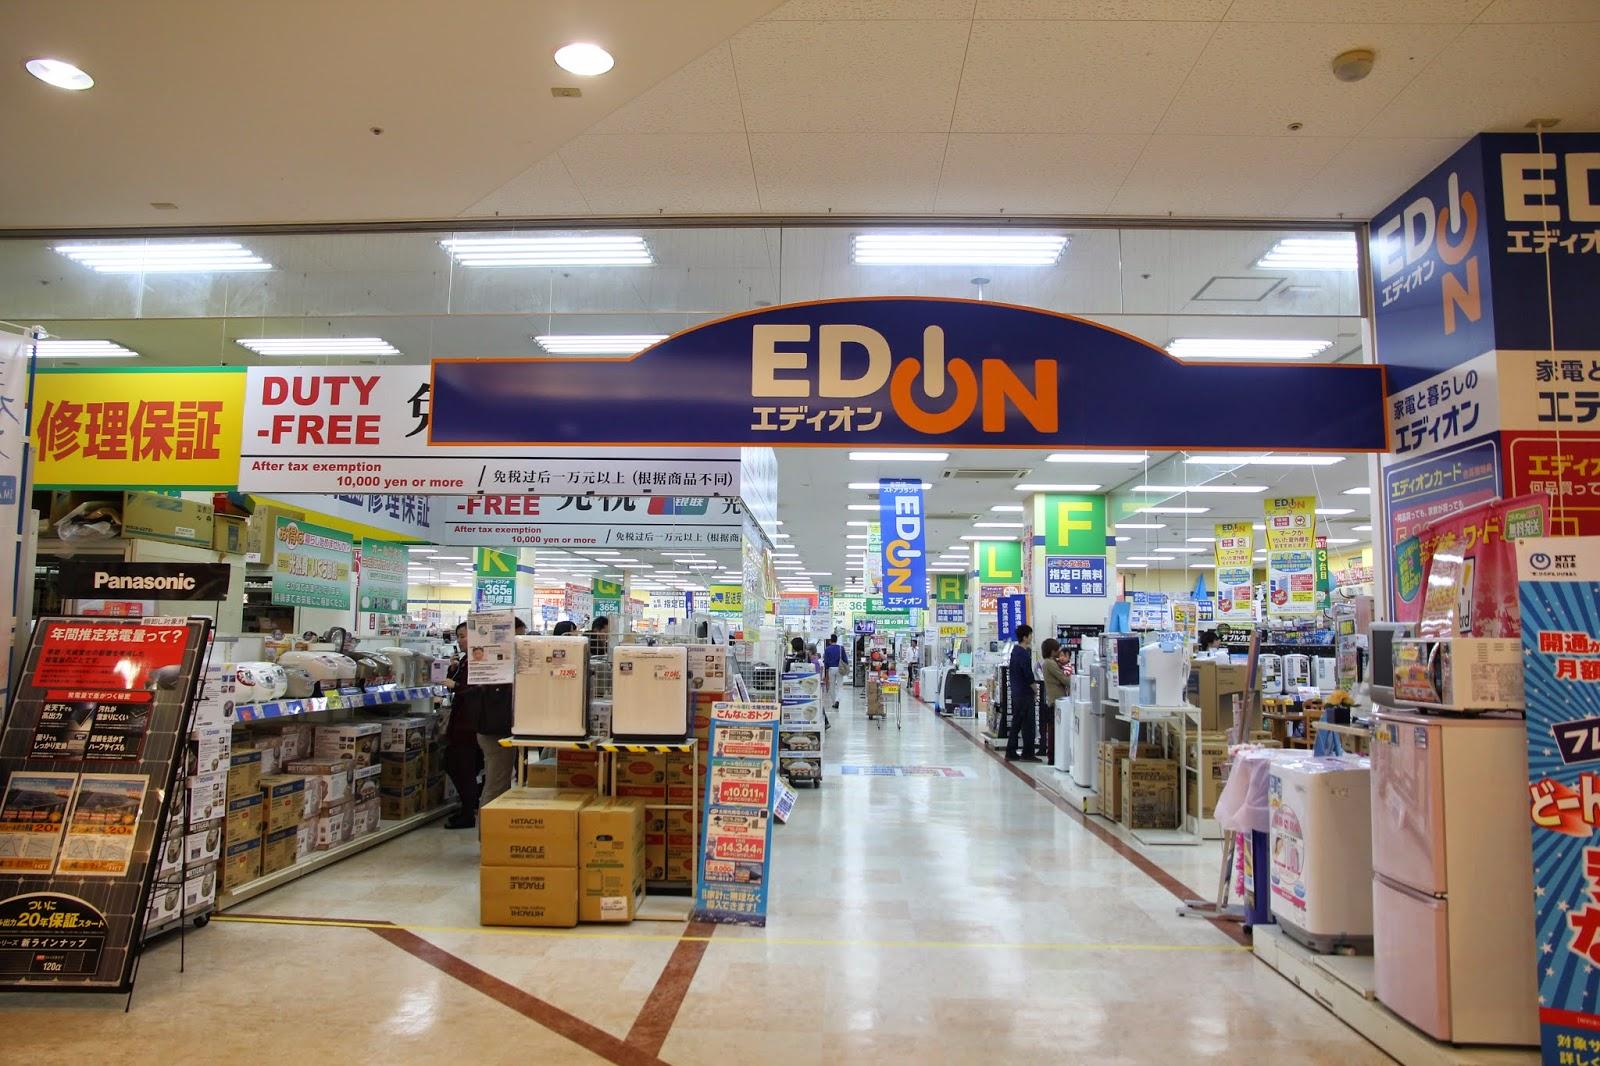 林公子生活遊記: DAY2-10 NAHA MAIN PLACE AFTERNOON TEA MISTER DONUT PIZZA 電器 百貨 市中心 購物中心